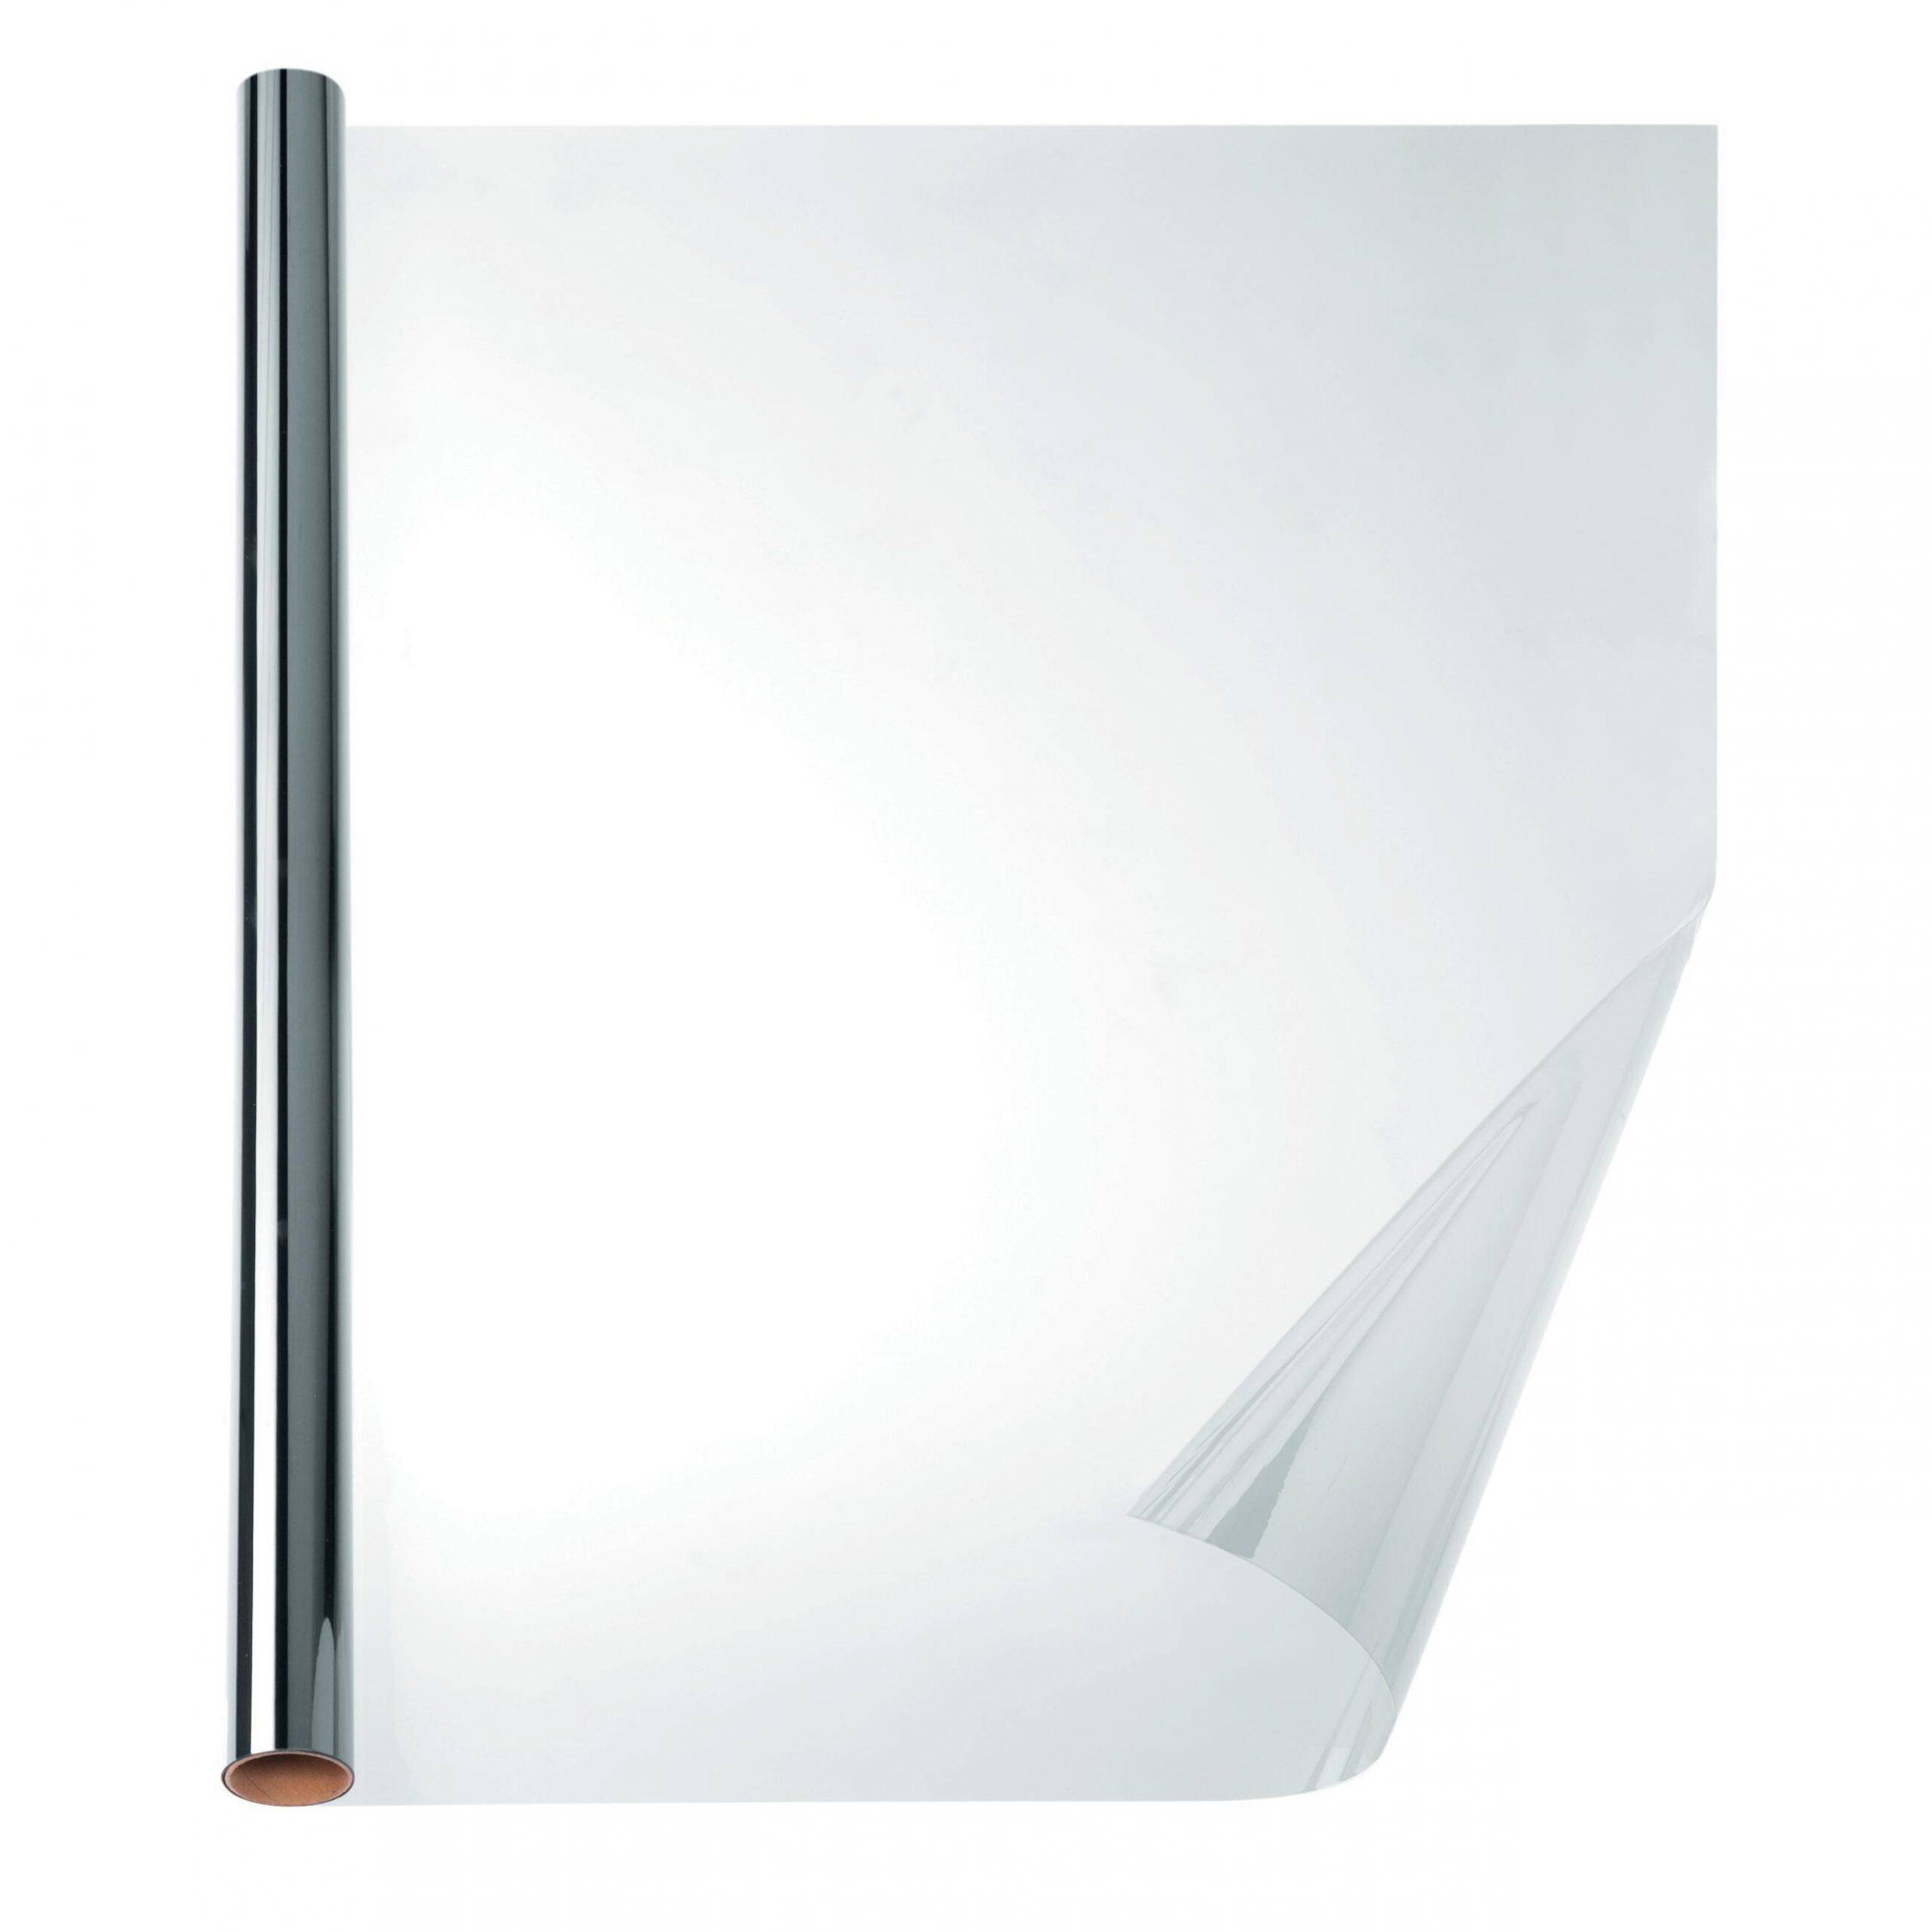 Pellicole Per Finestre Solari Leroy Merlin